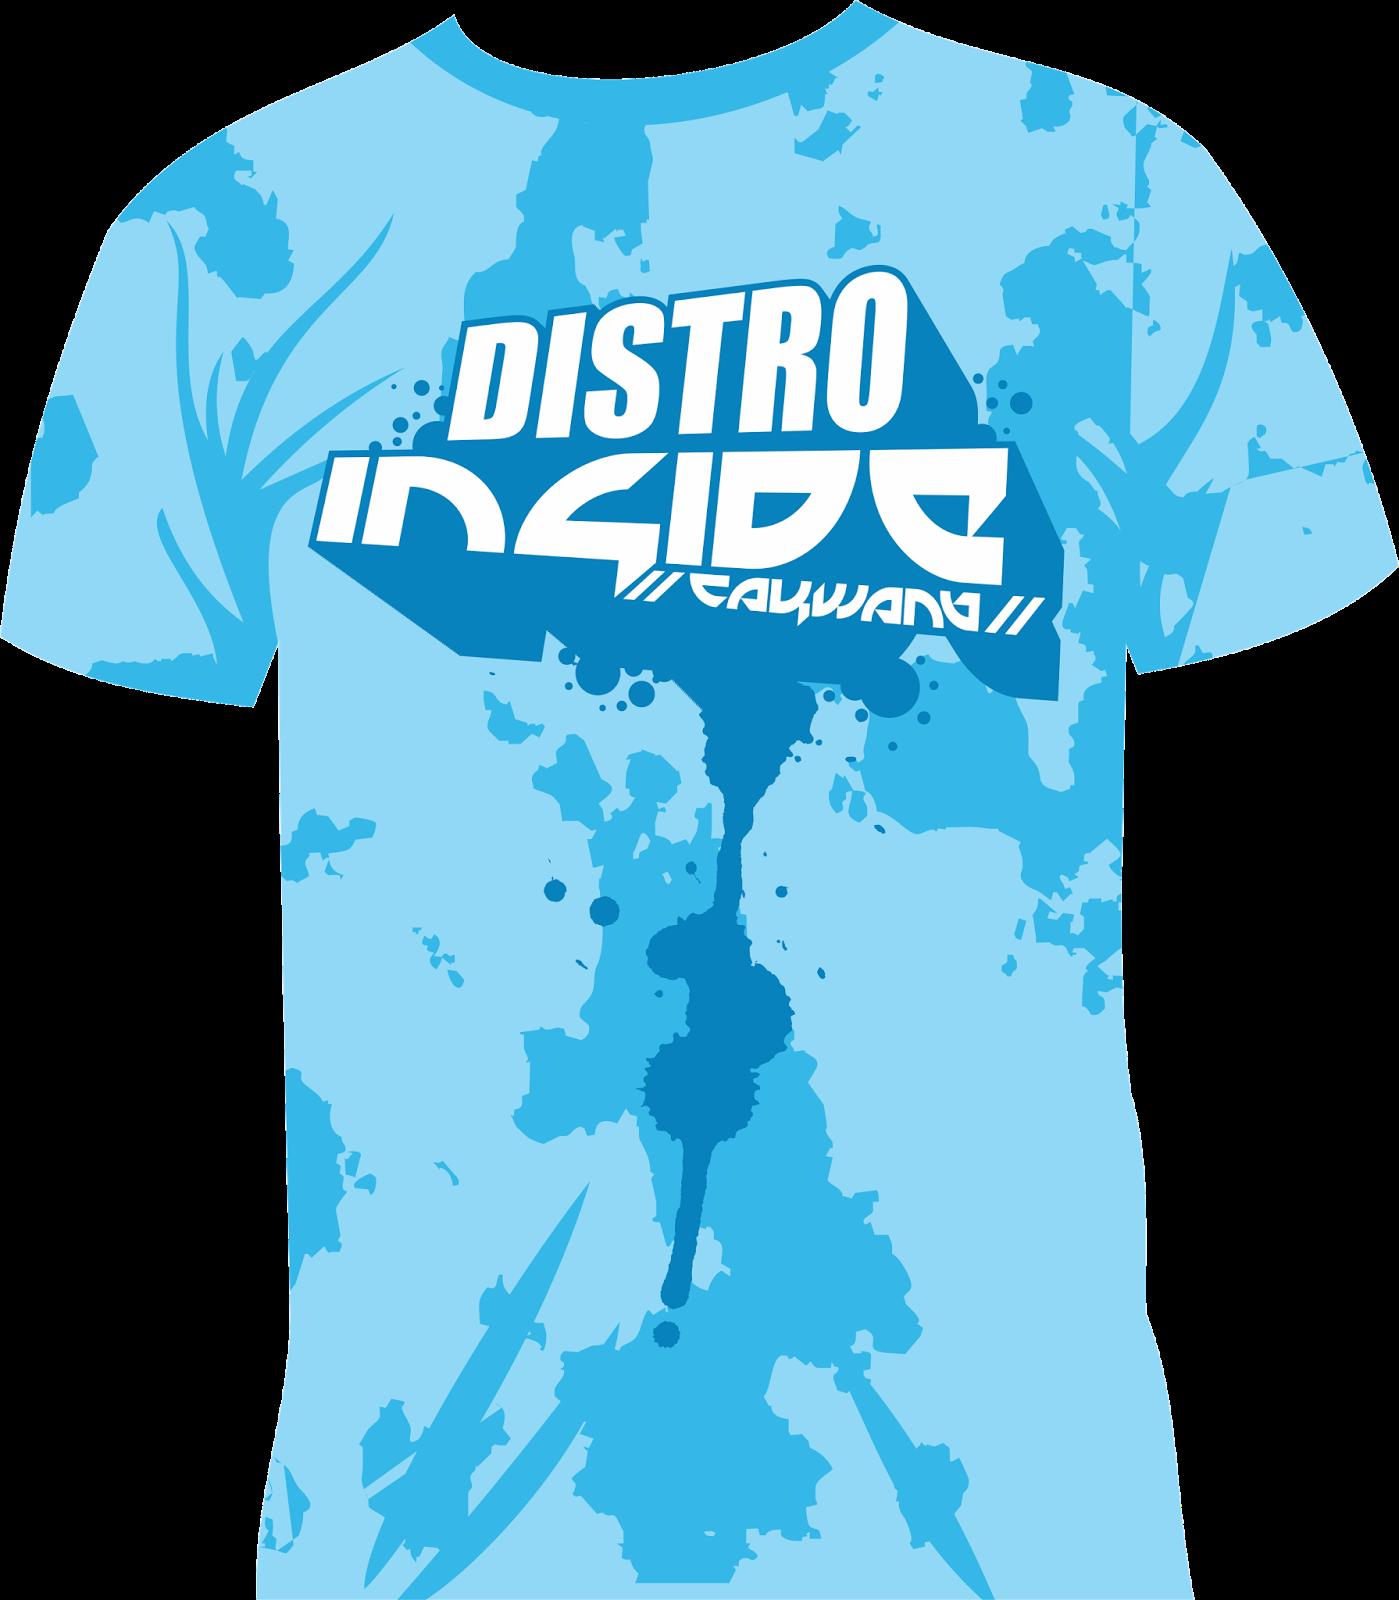 Kumpulan Desain Baju Kaos Oblong | 1001desainer